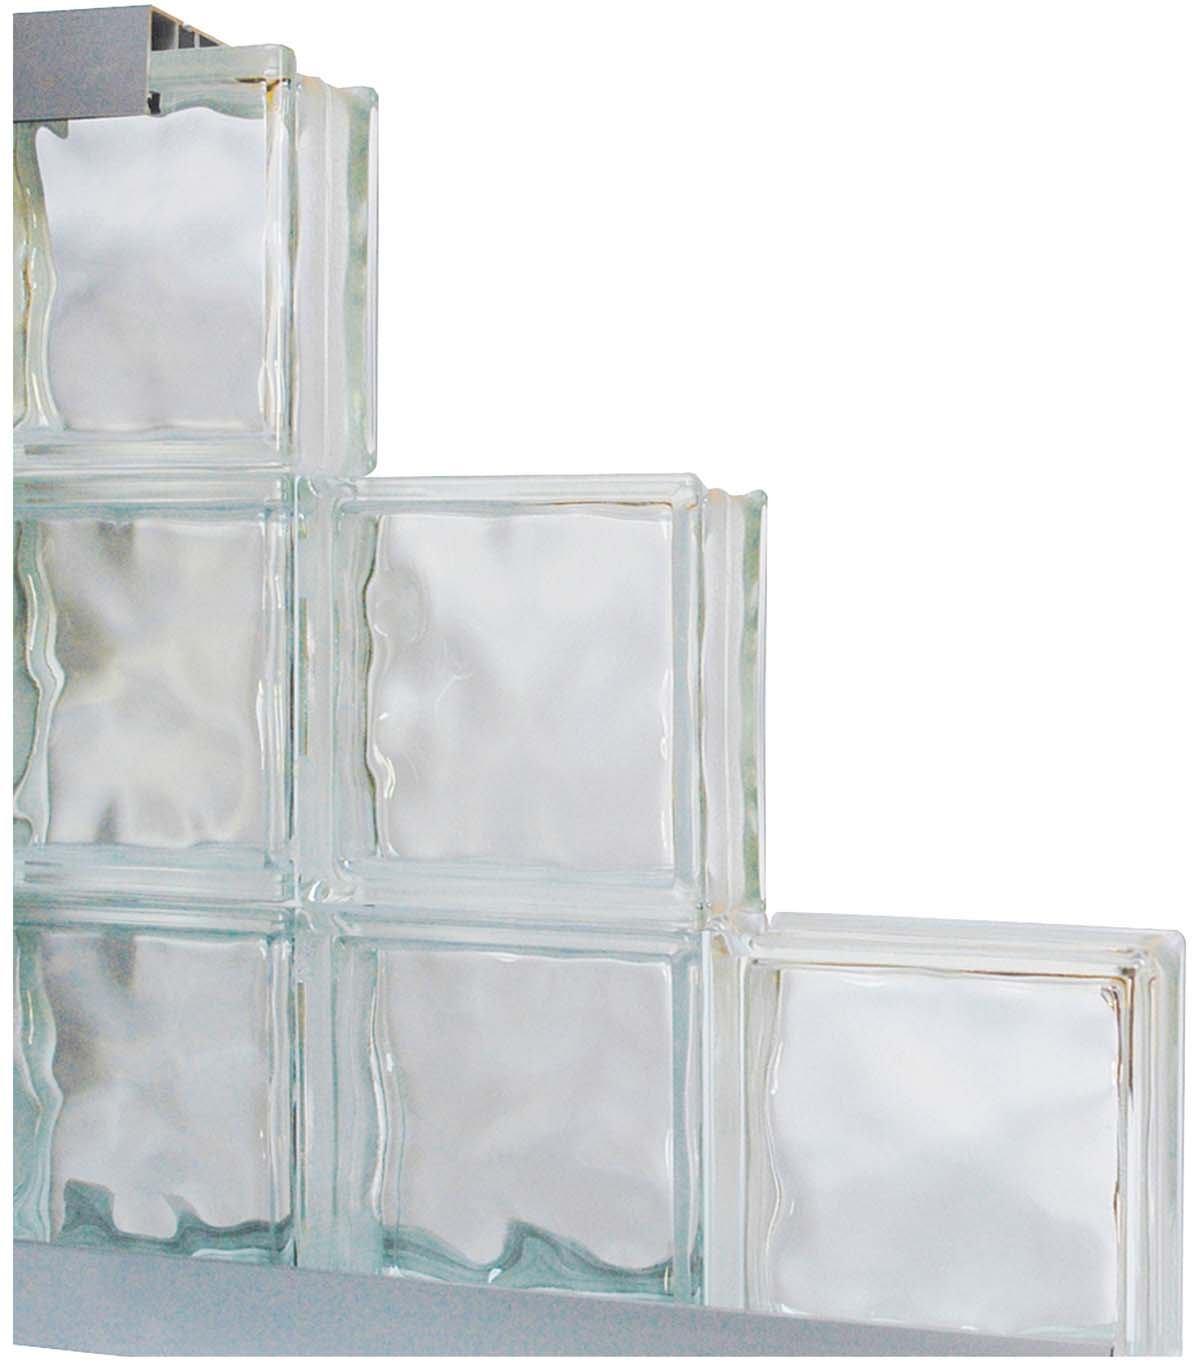 7e6e4d blast resistant glass block panel from pittsburgh corning architect glass block windows pittsburgh pa